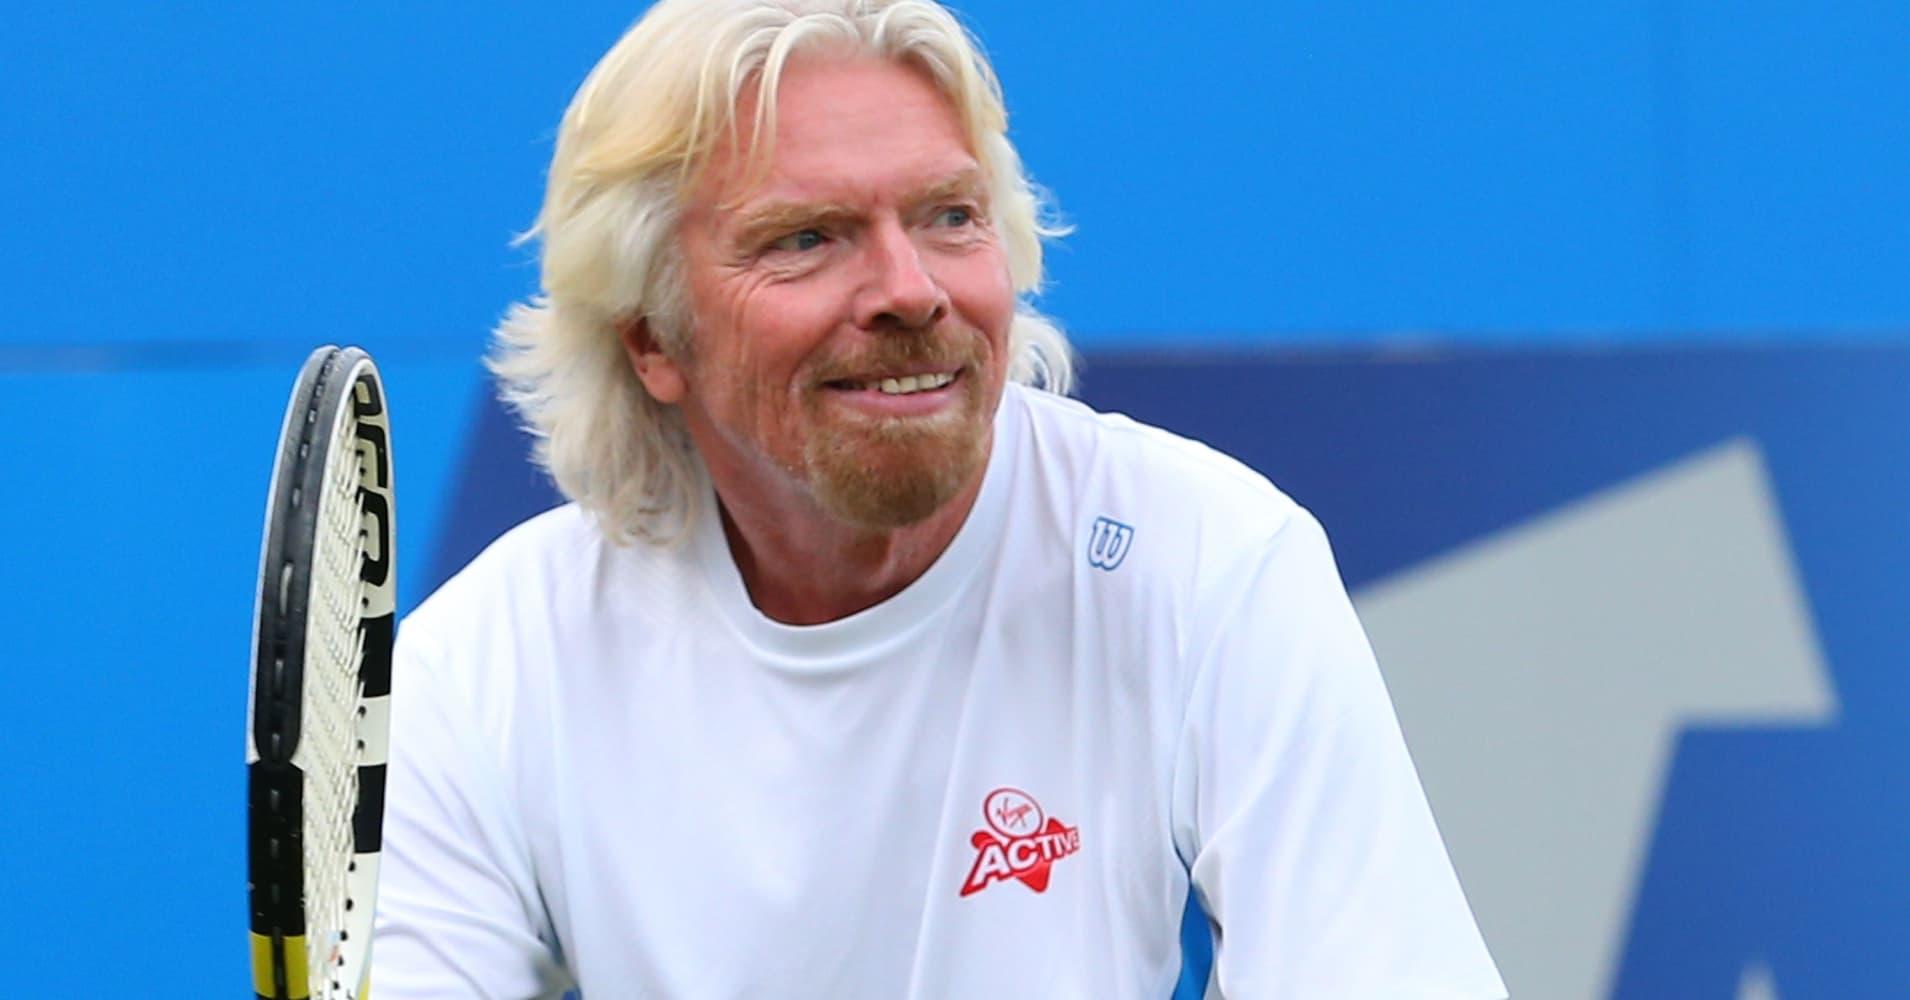 Billionaire Richard Branson The critical business lesson